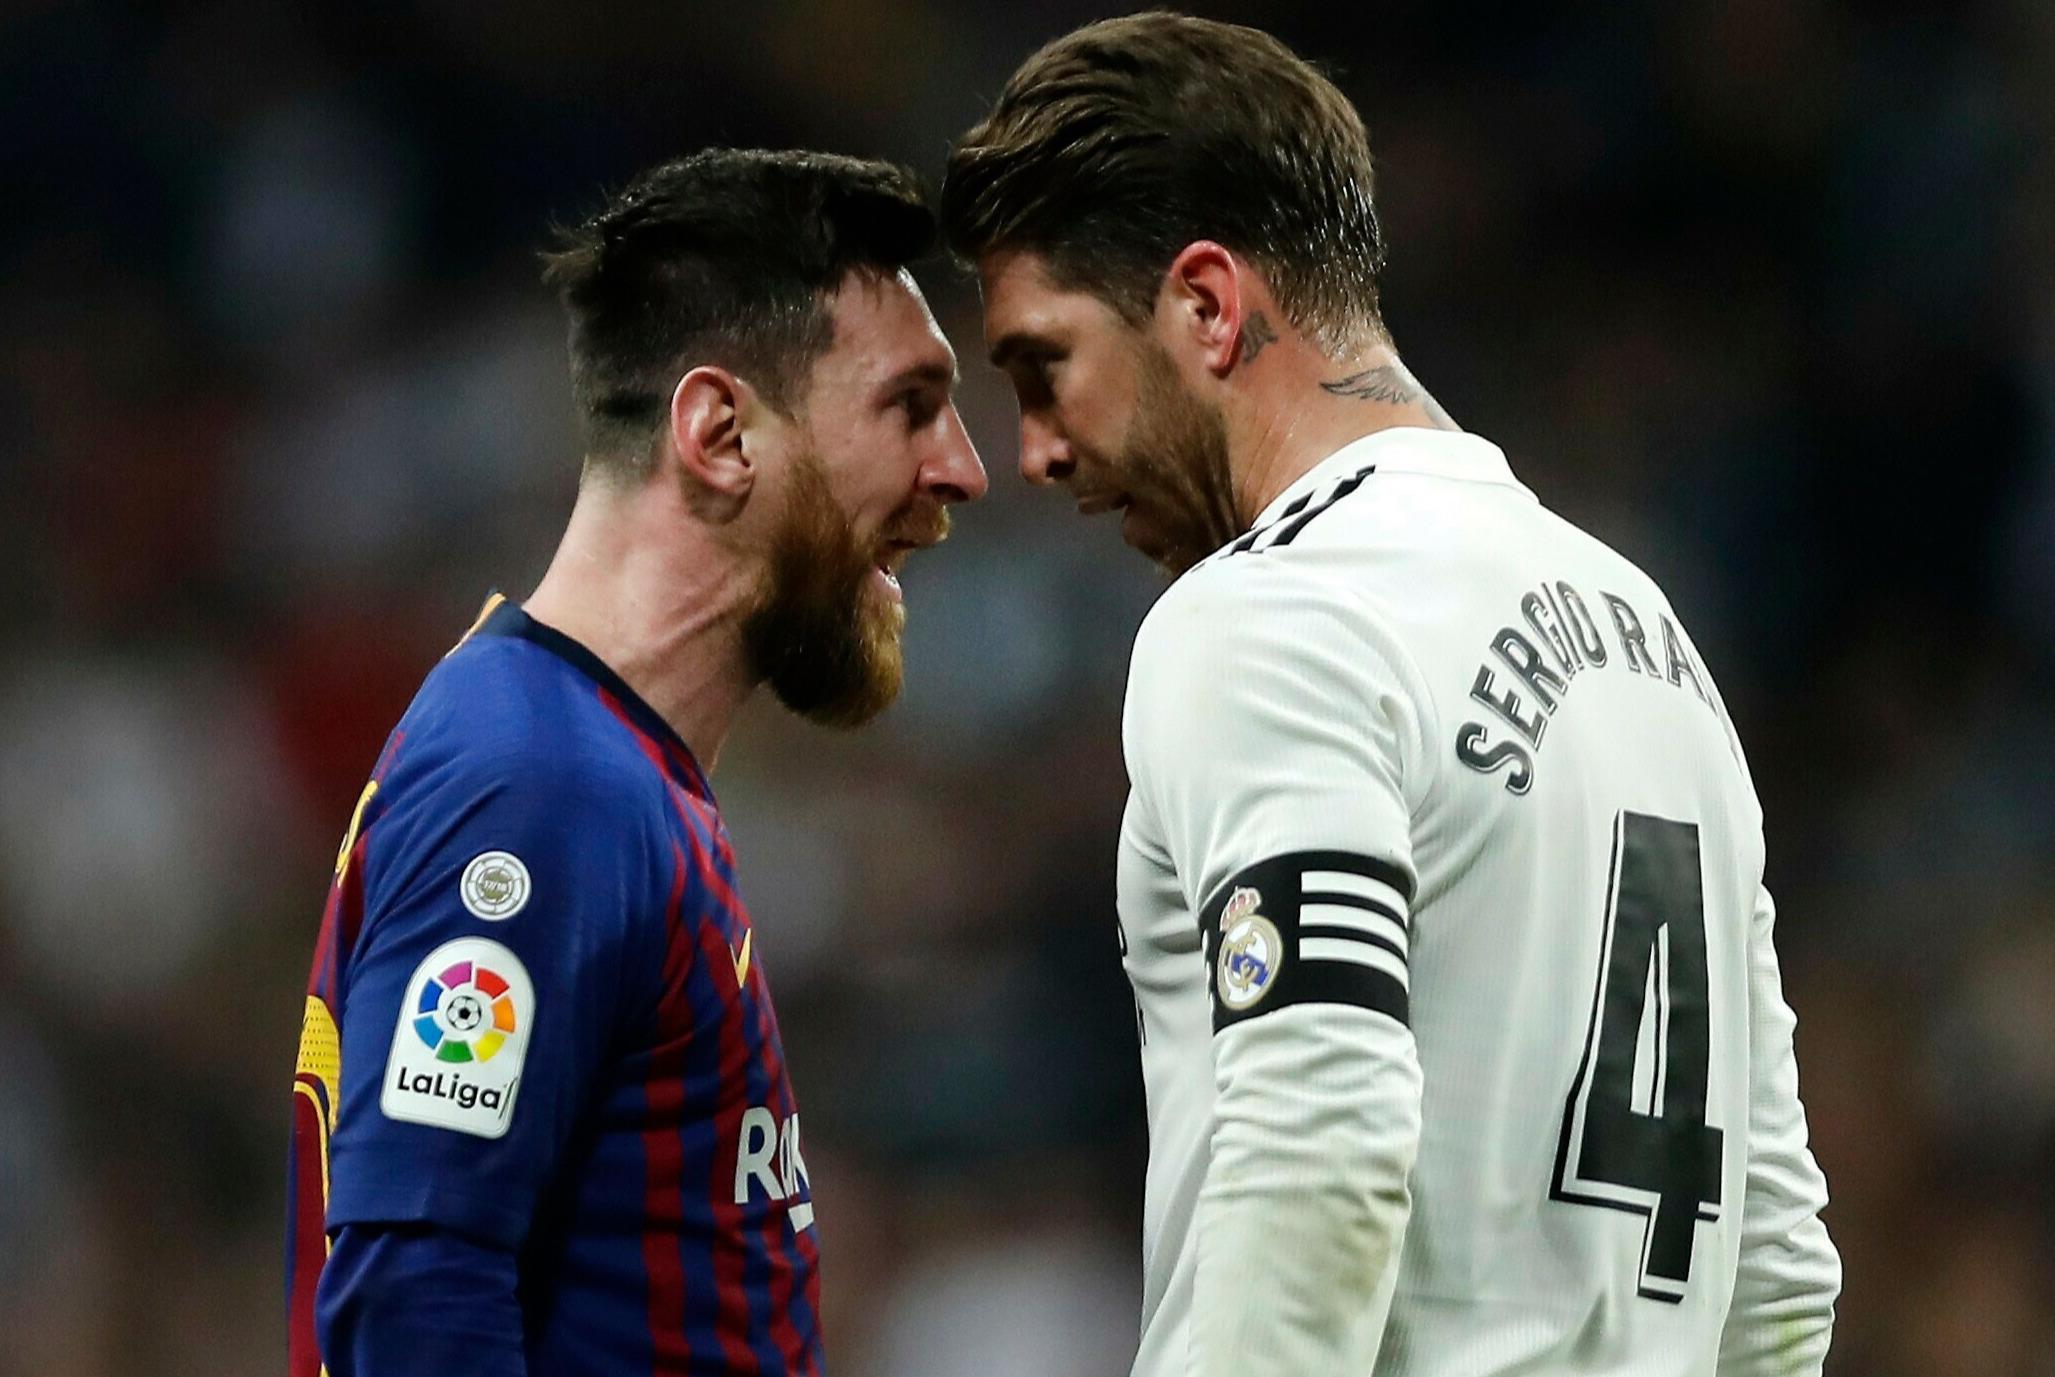 Spanish football evening headlines: Messi hugs Ramos, Pedri returns to Barcelona, Mbappe welcomes Messi